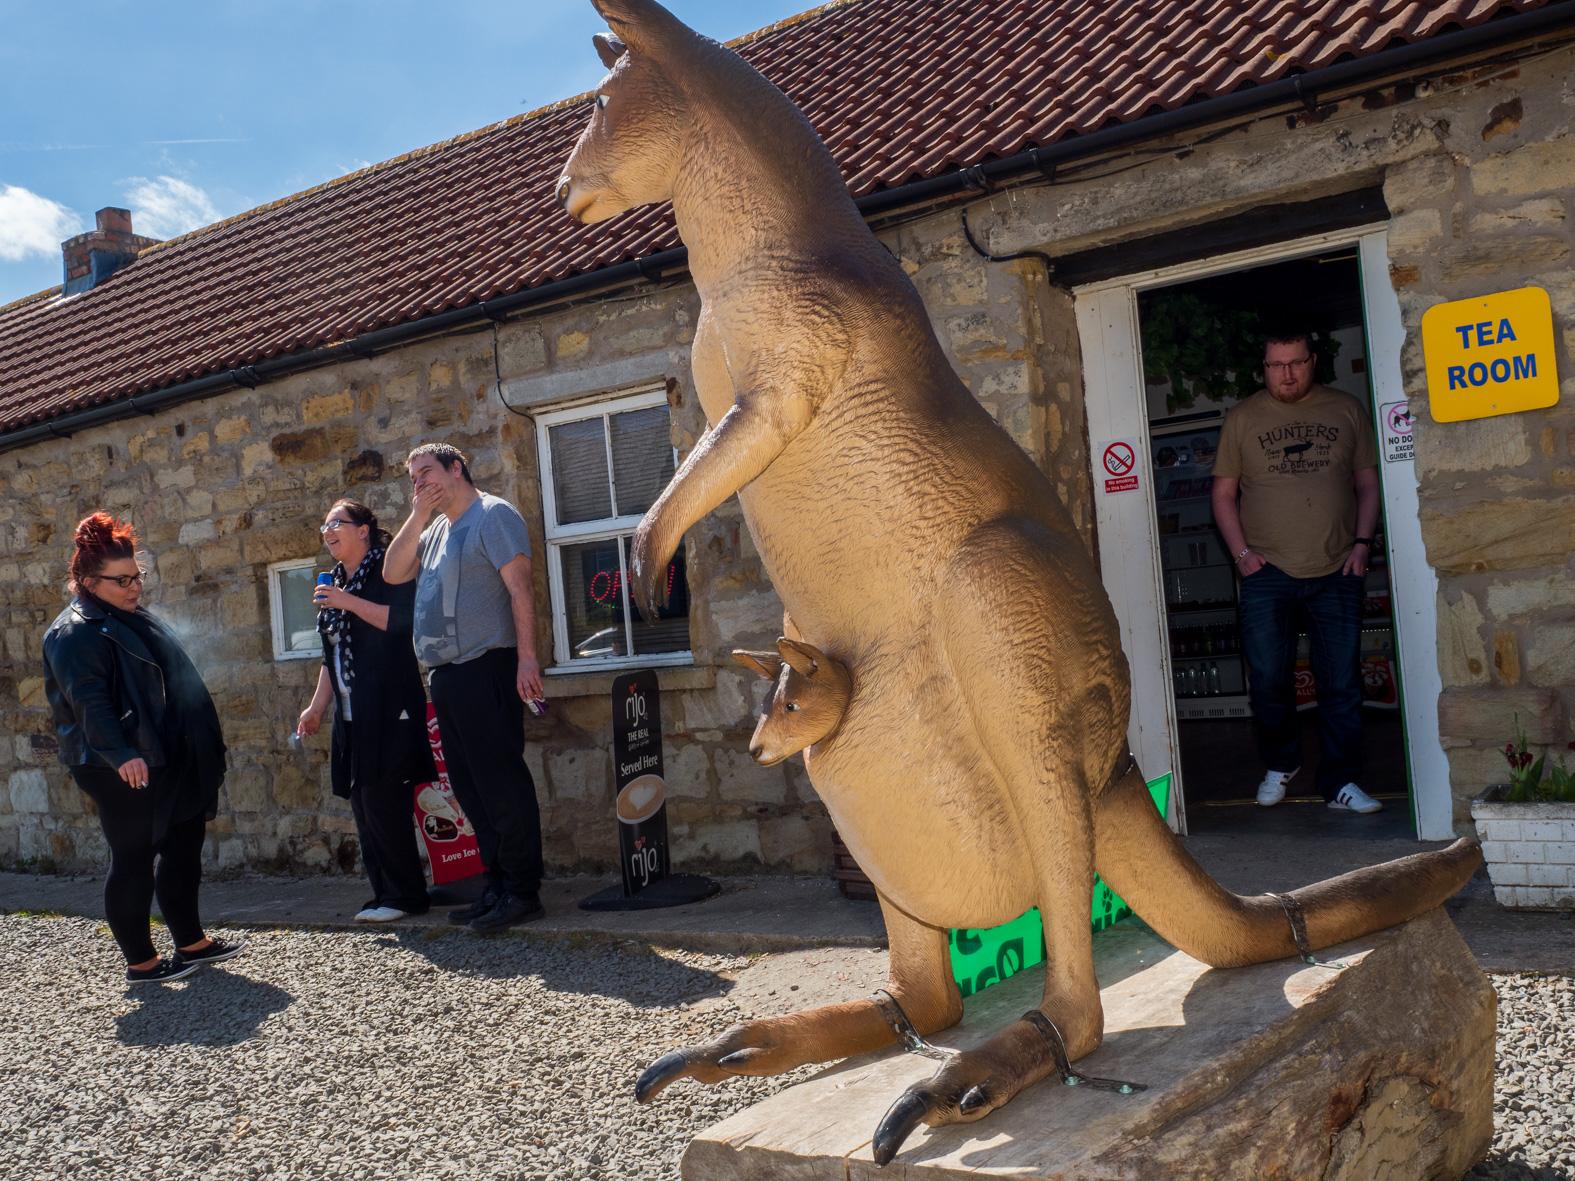 Entrnce to the tea room at Esshottheugh Animal Park. Morpeth, Northumberland.